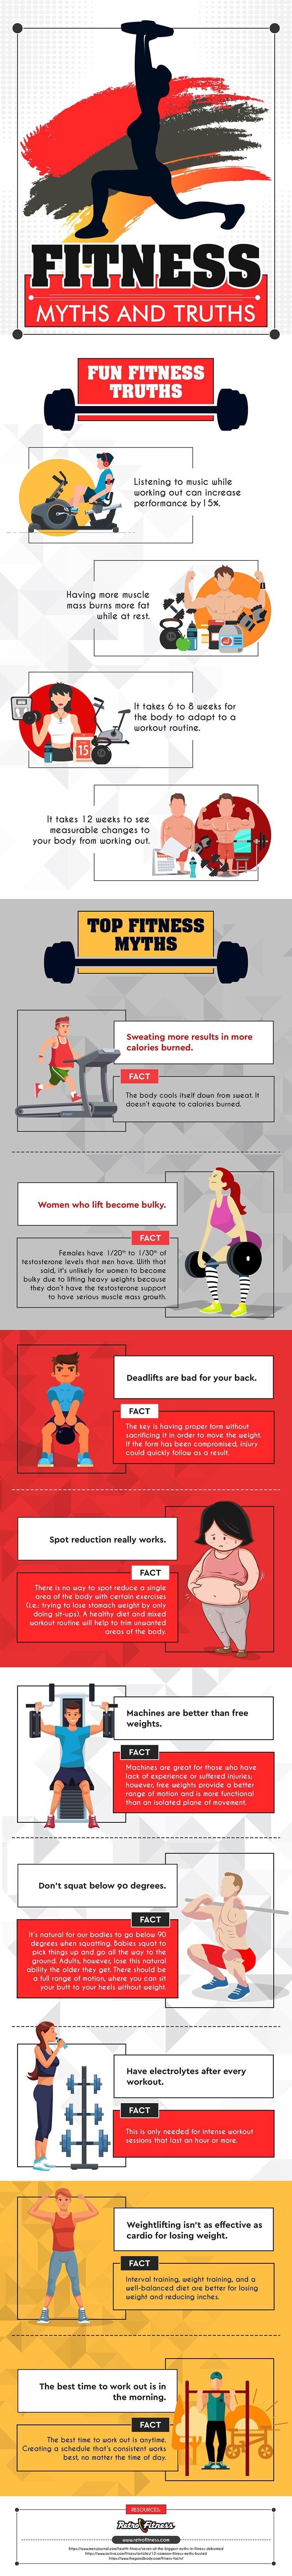 Retro Fitness Myths Truths